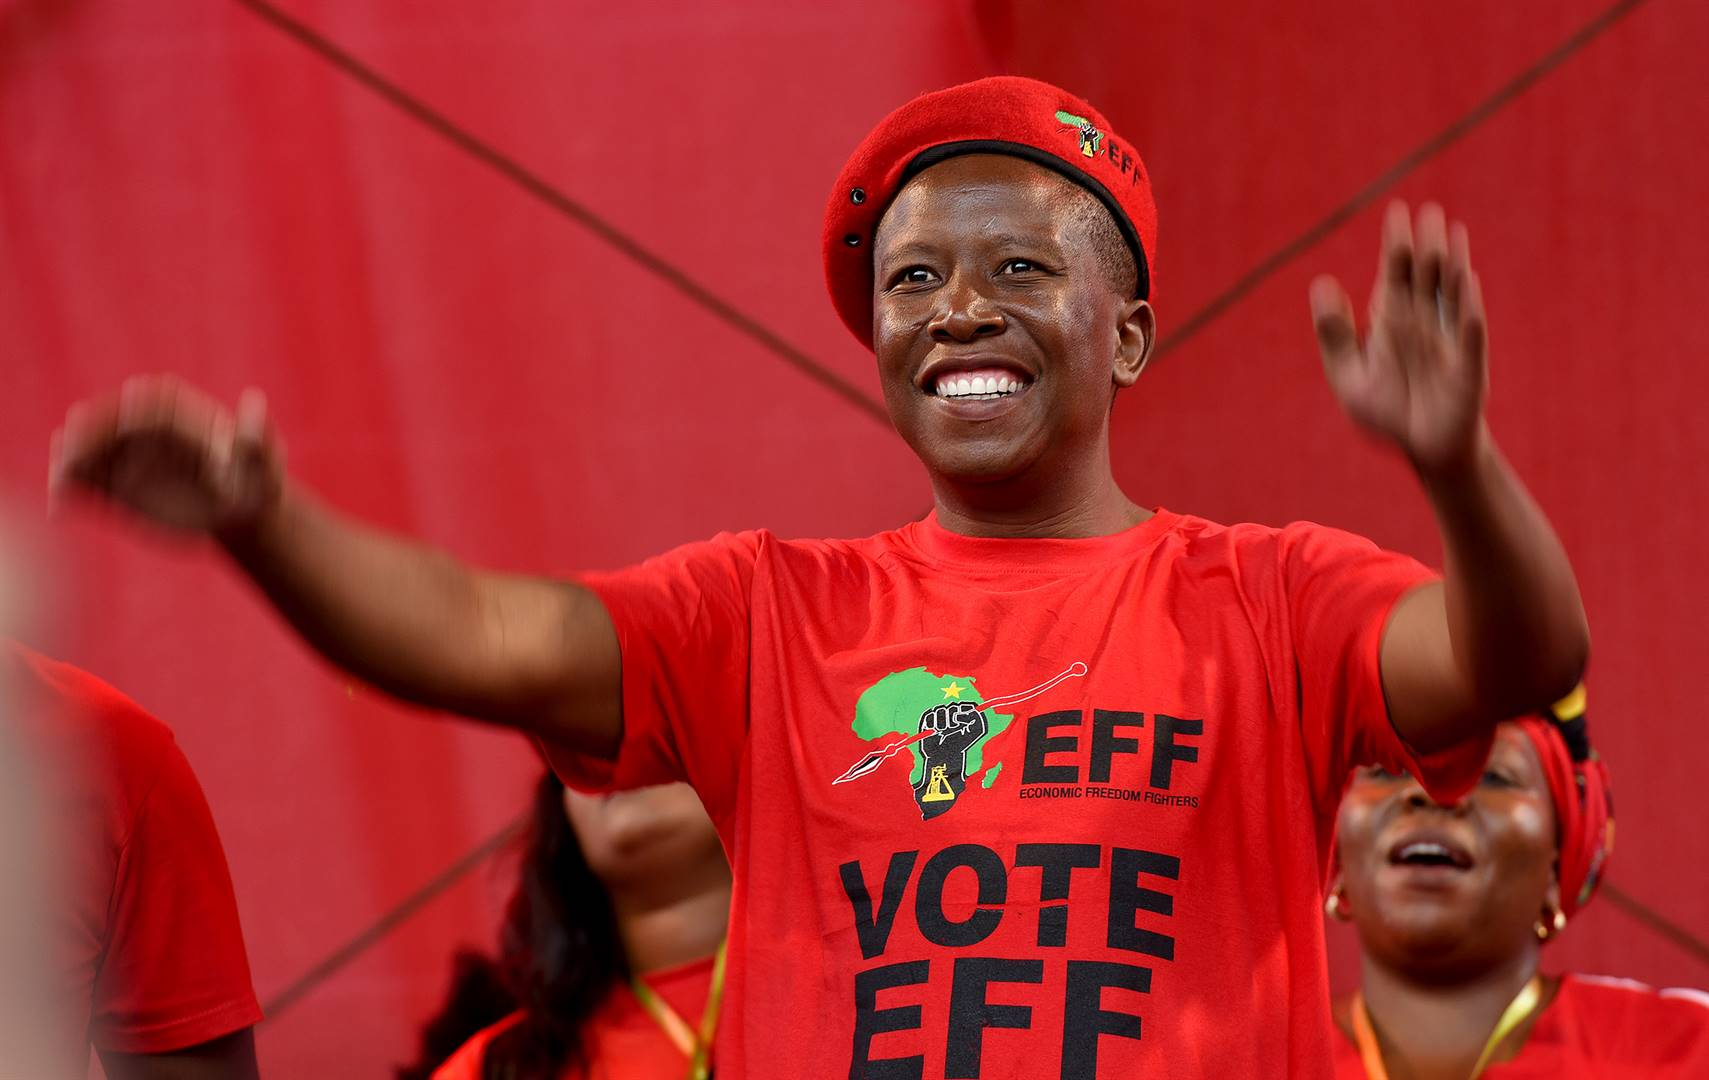 EFF leader Julius Malema. Picture: Tebogo Letsie/City Press